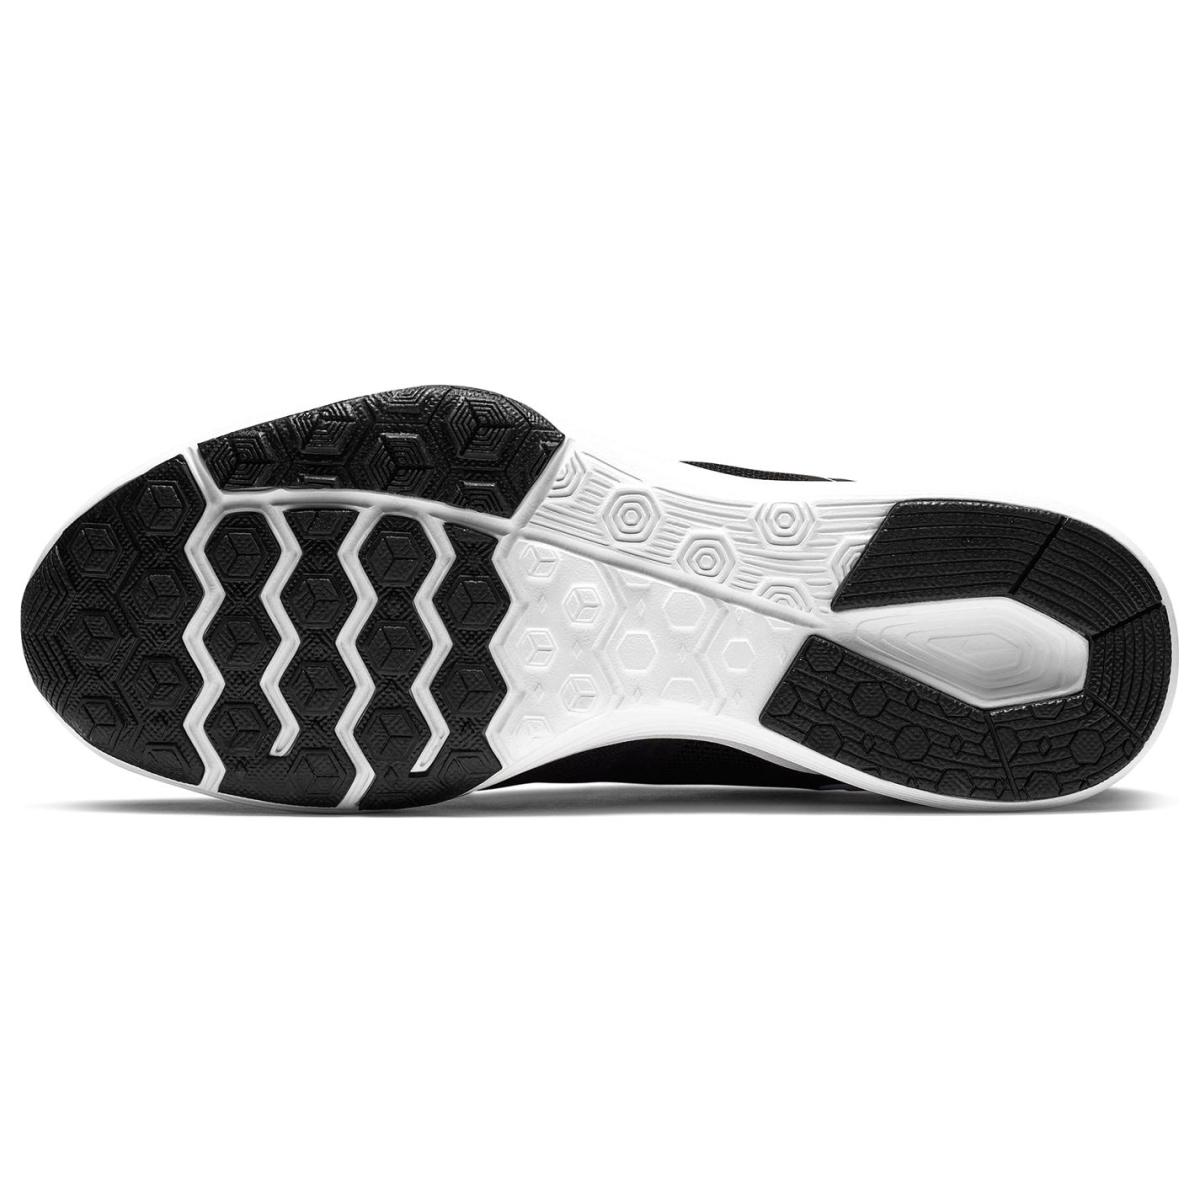 Nike-City-Trainer-2-Turnschuhe-Laufschuhe-Damen-Sportschuhe-Sneaker-3121 Indexbild 7